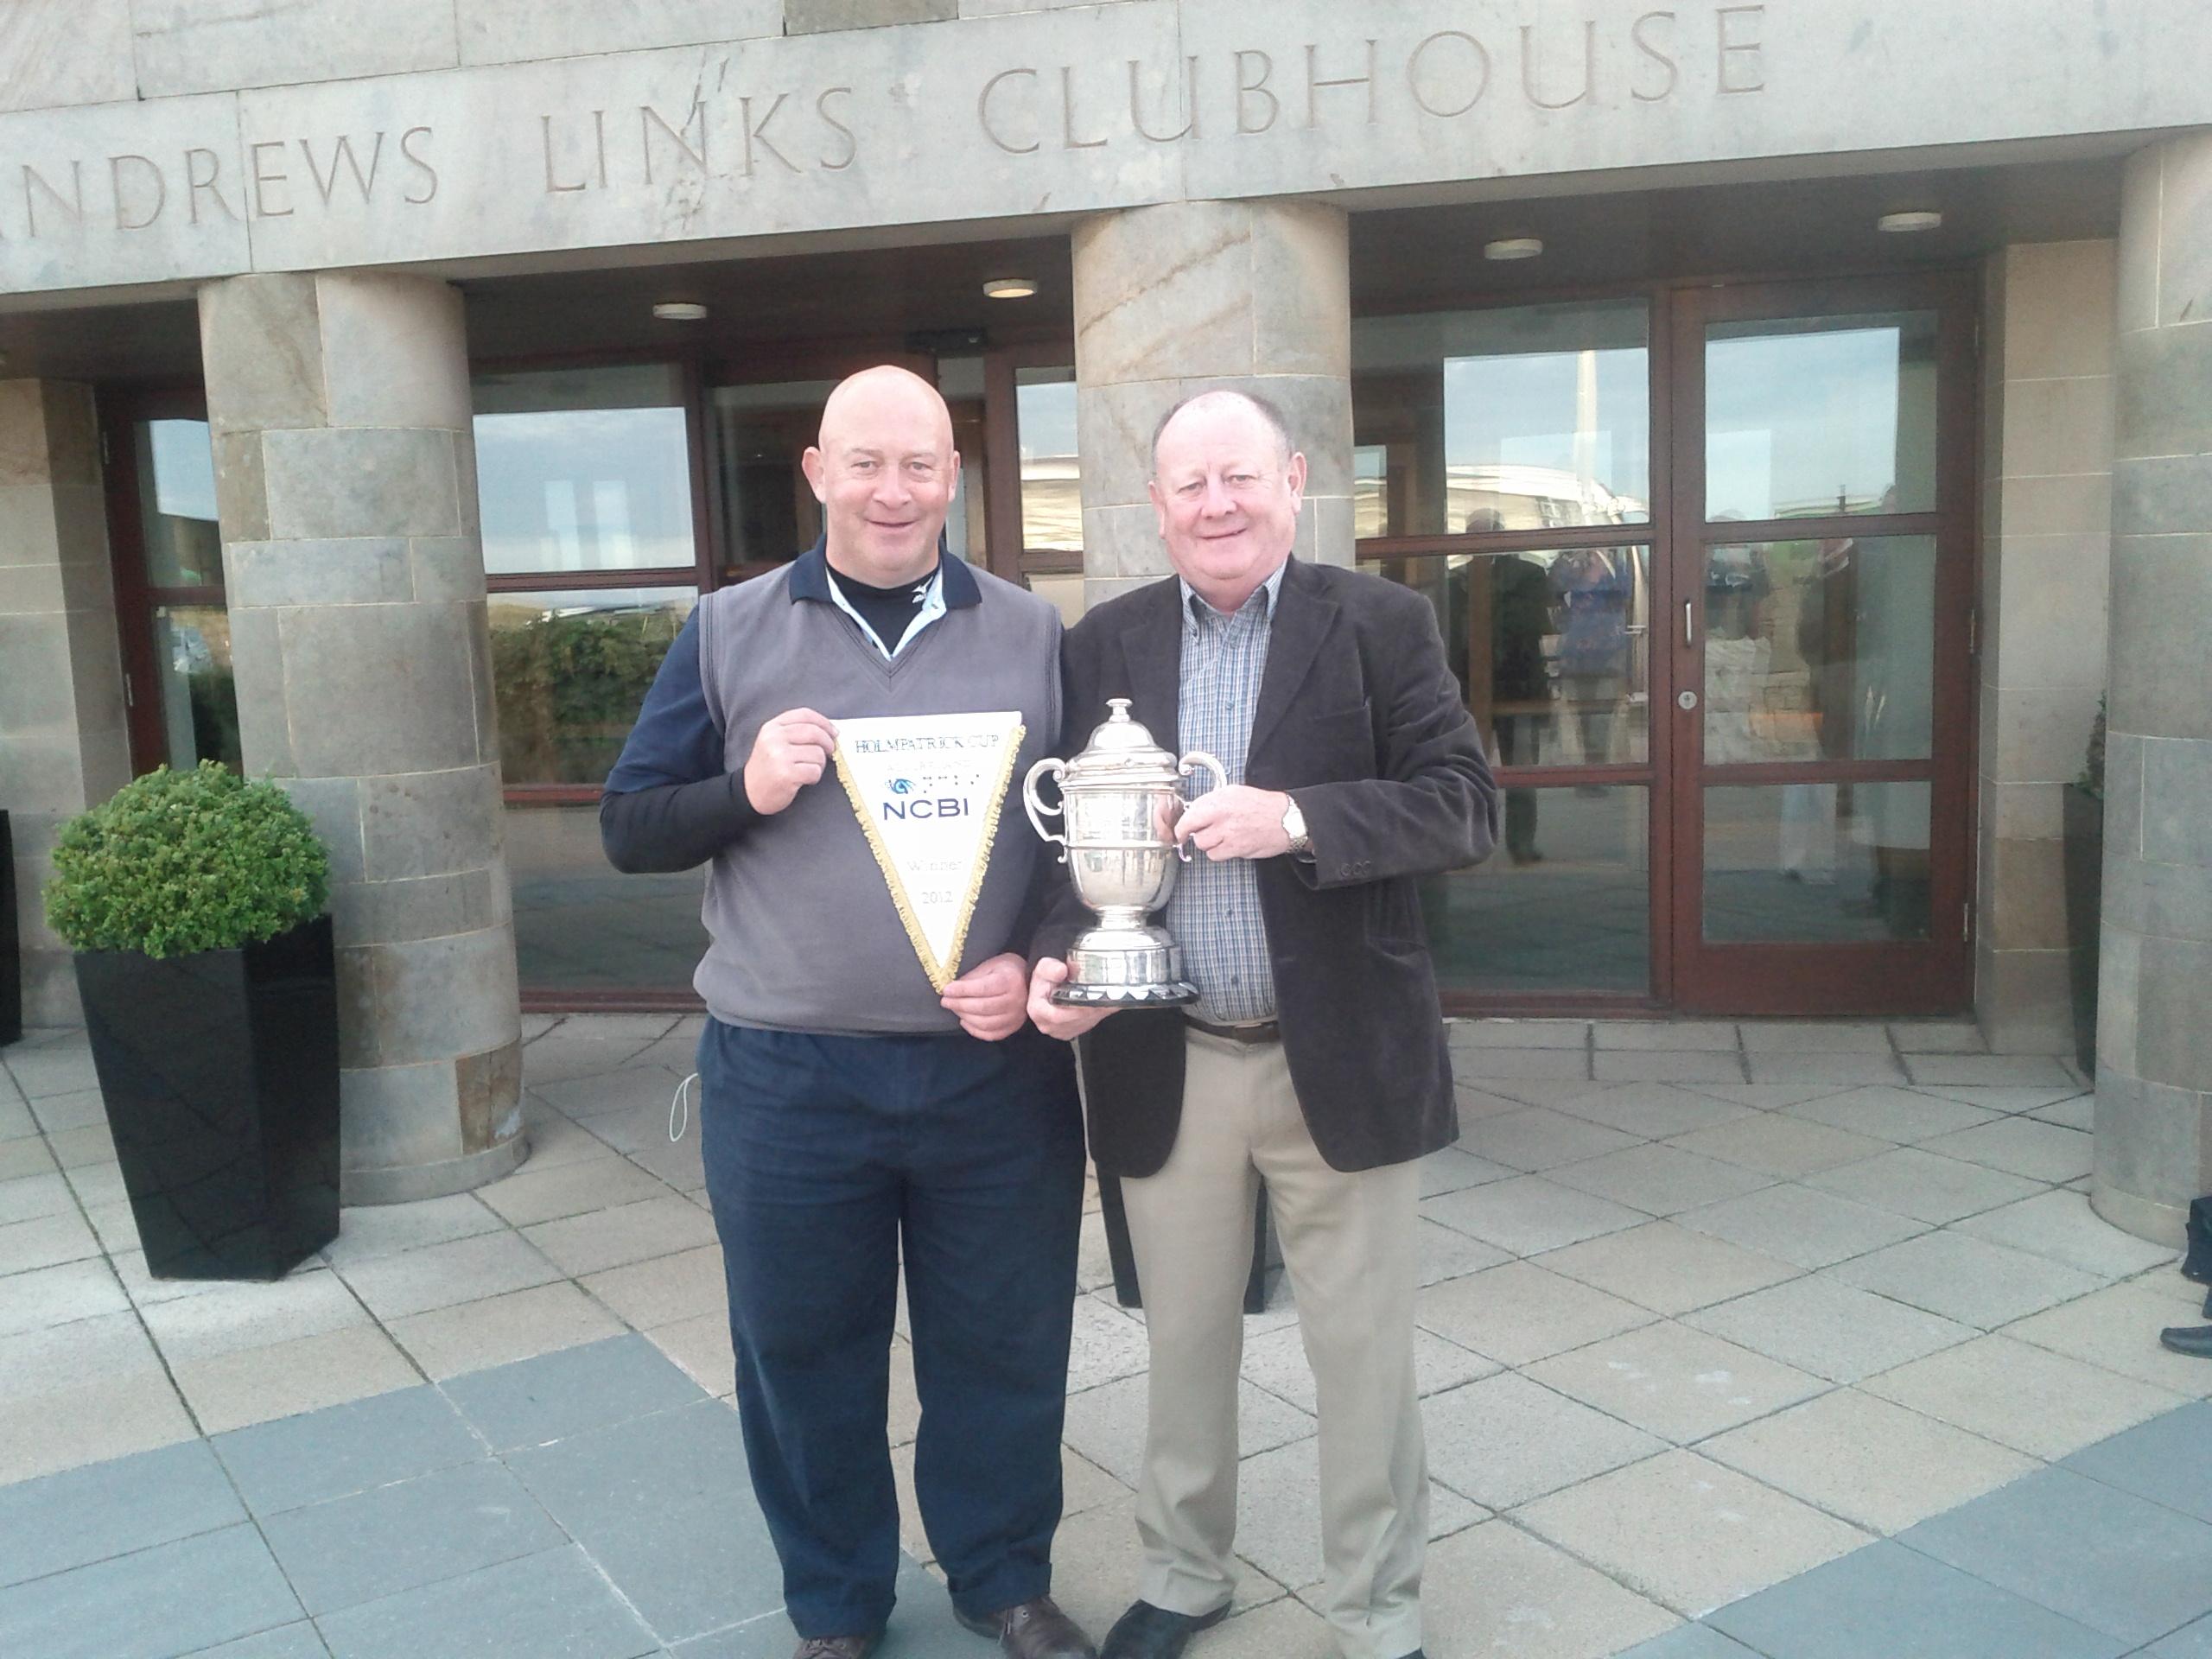 2012 All Ireland Winners